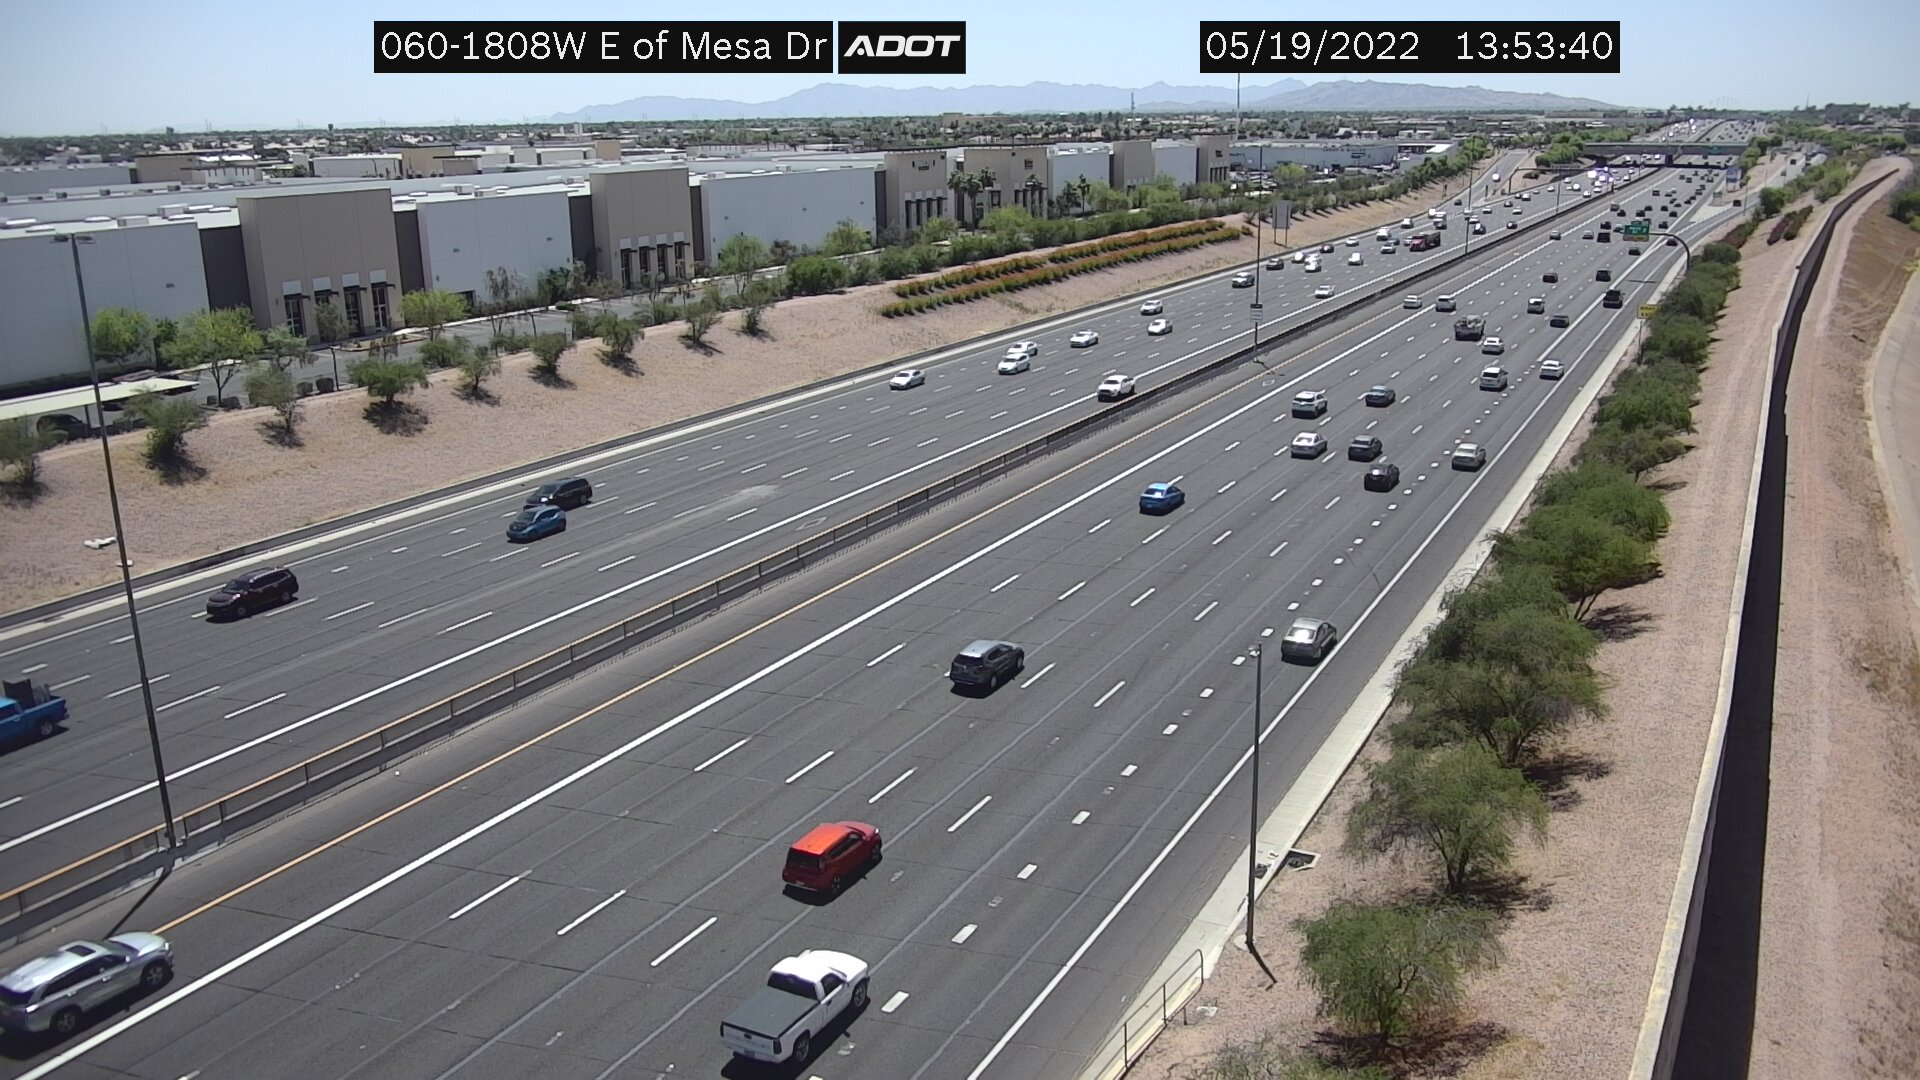 E of Mesa WB (US60) (181) - Phoenix and Arizona